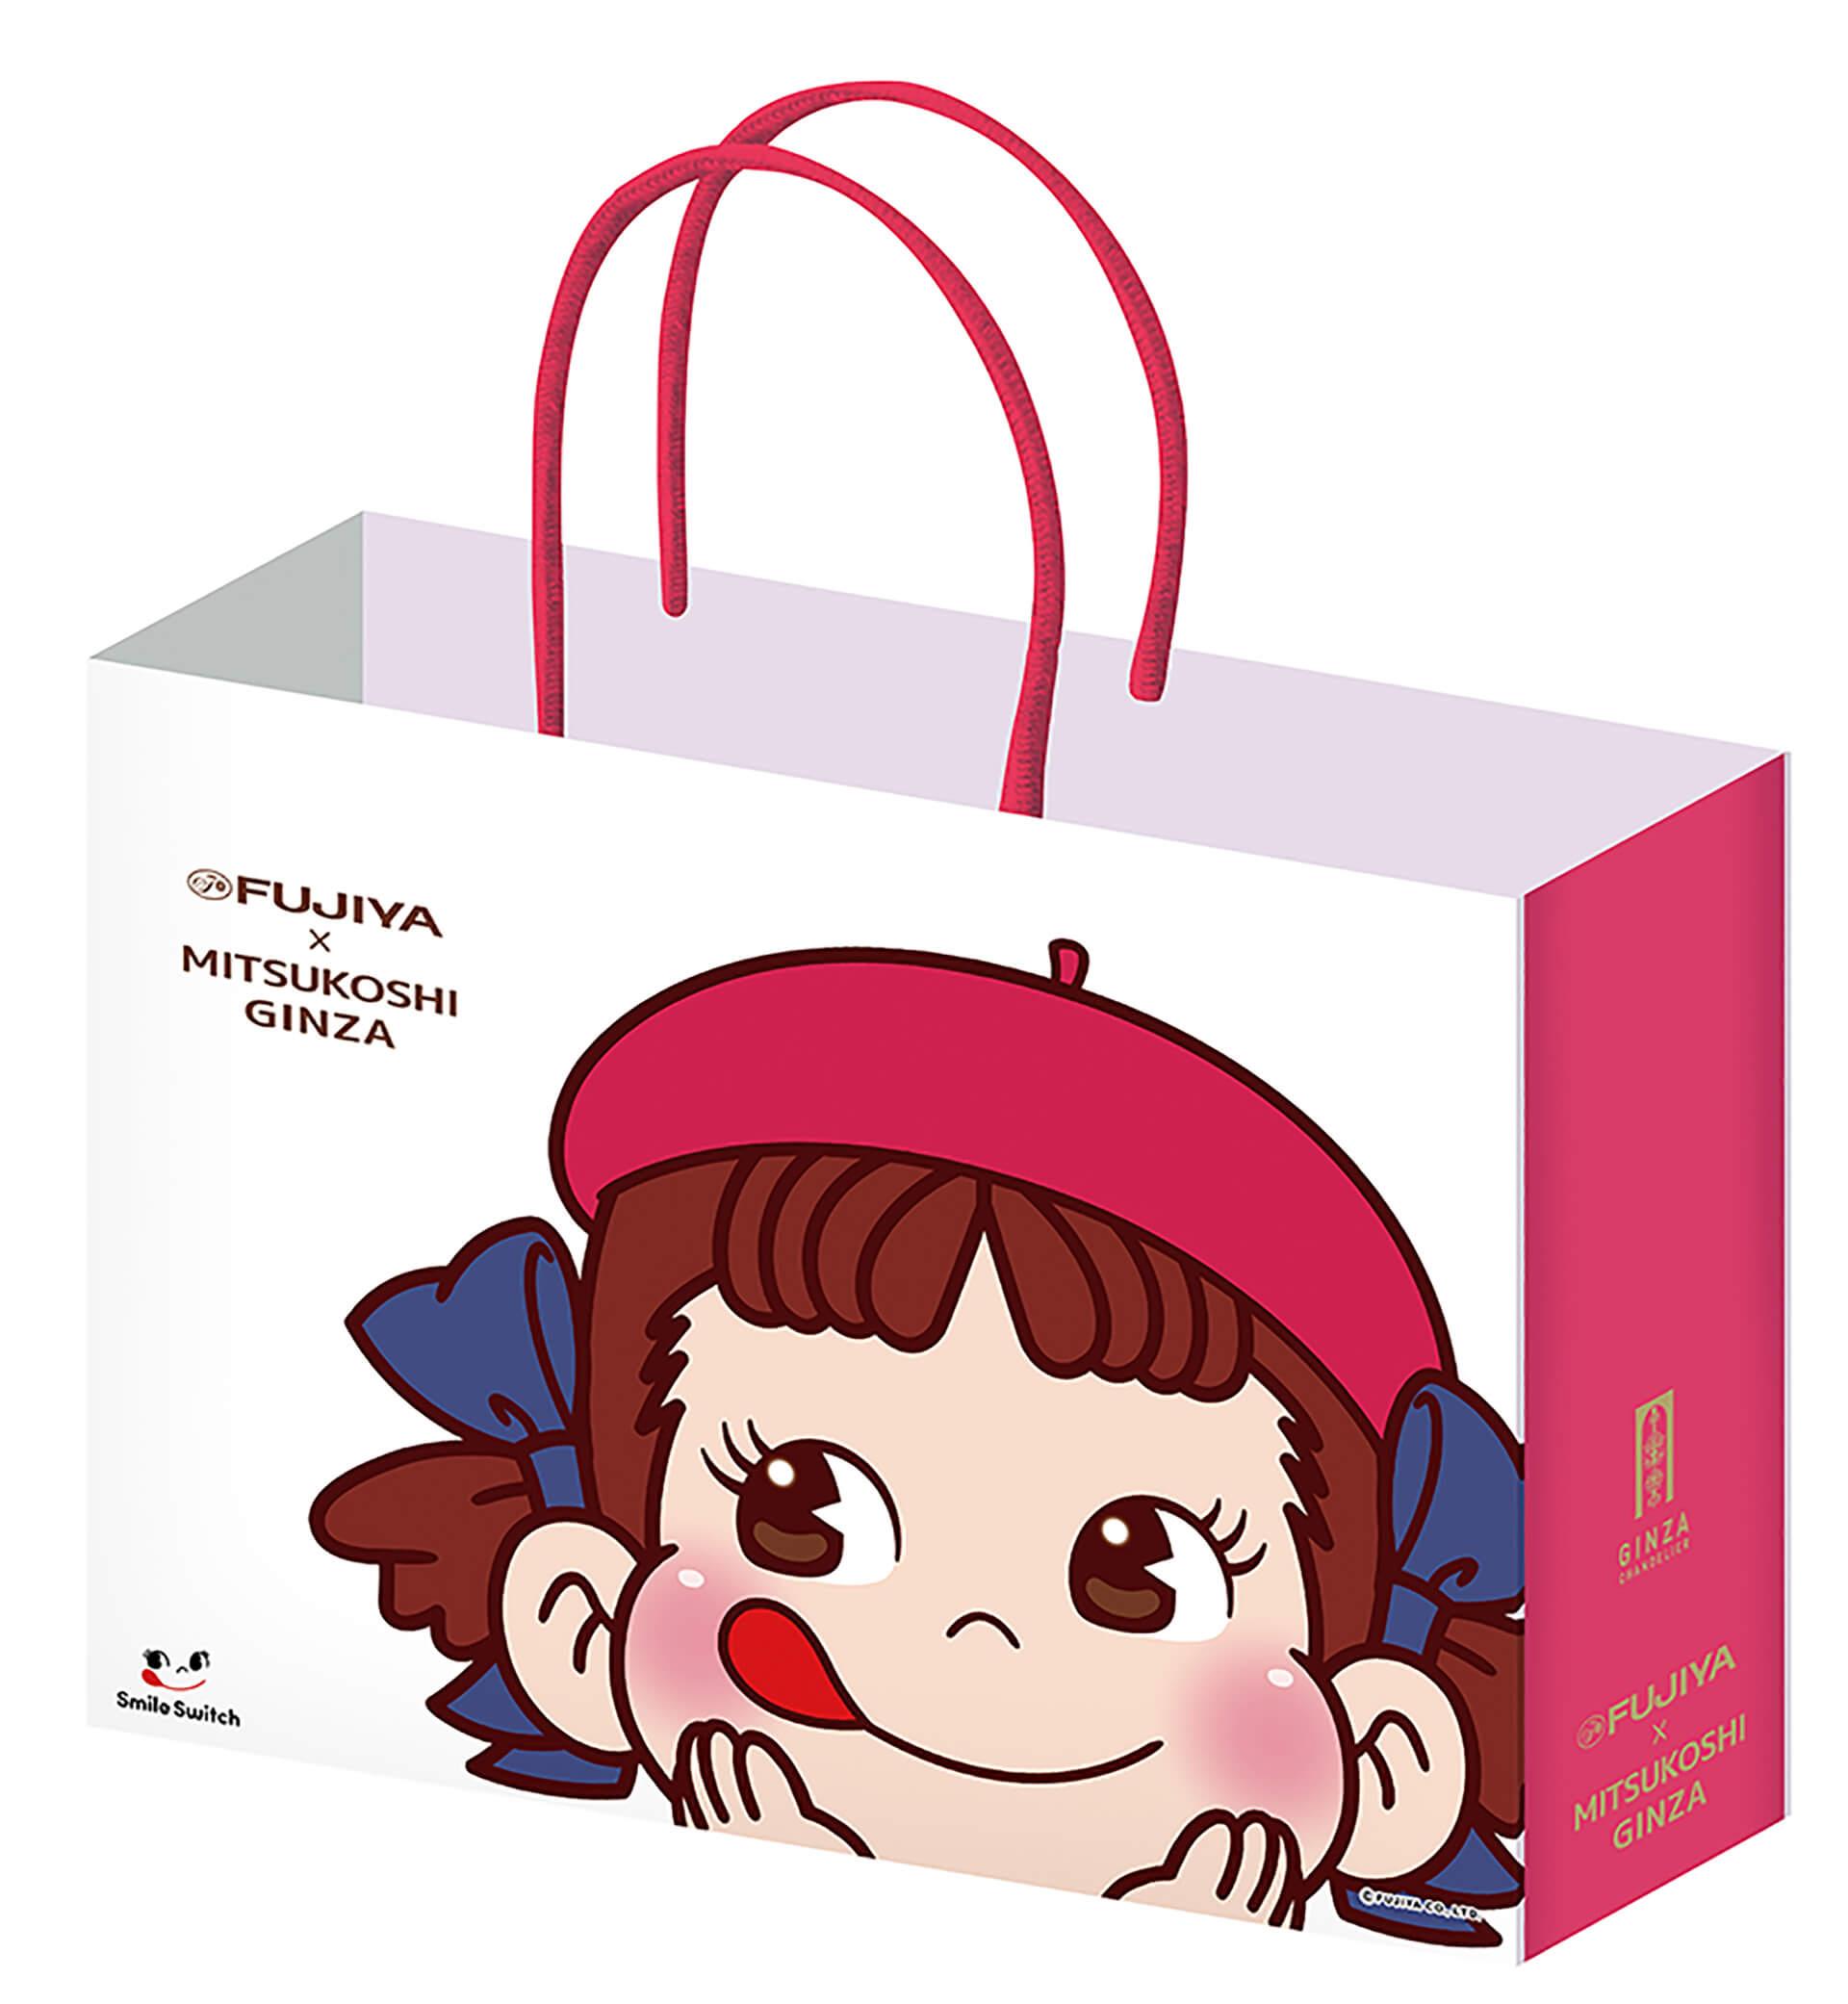 FUJIYA Smile Switch Valentine 2021 in GINZA